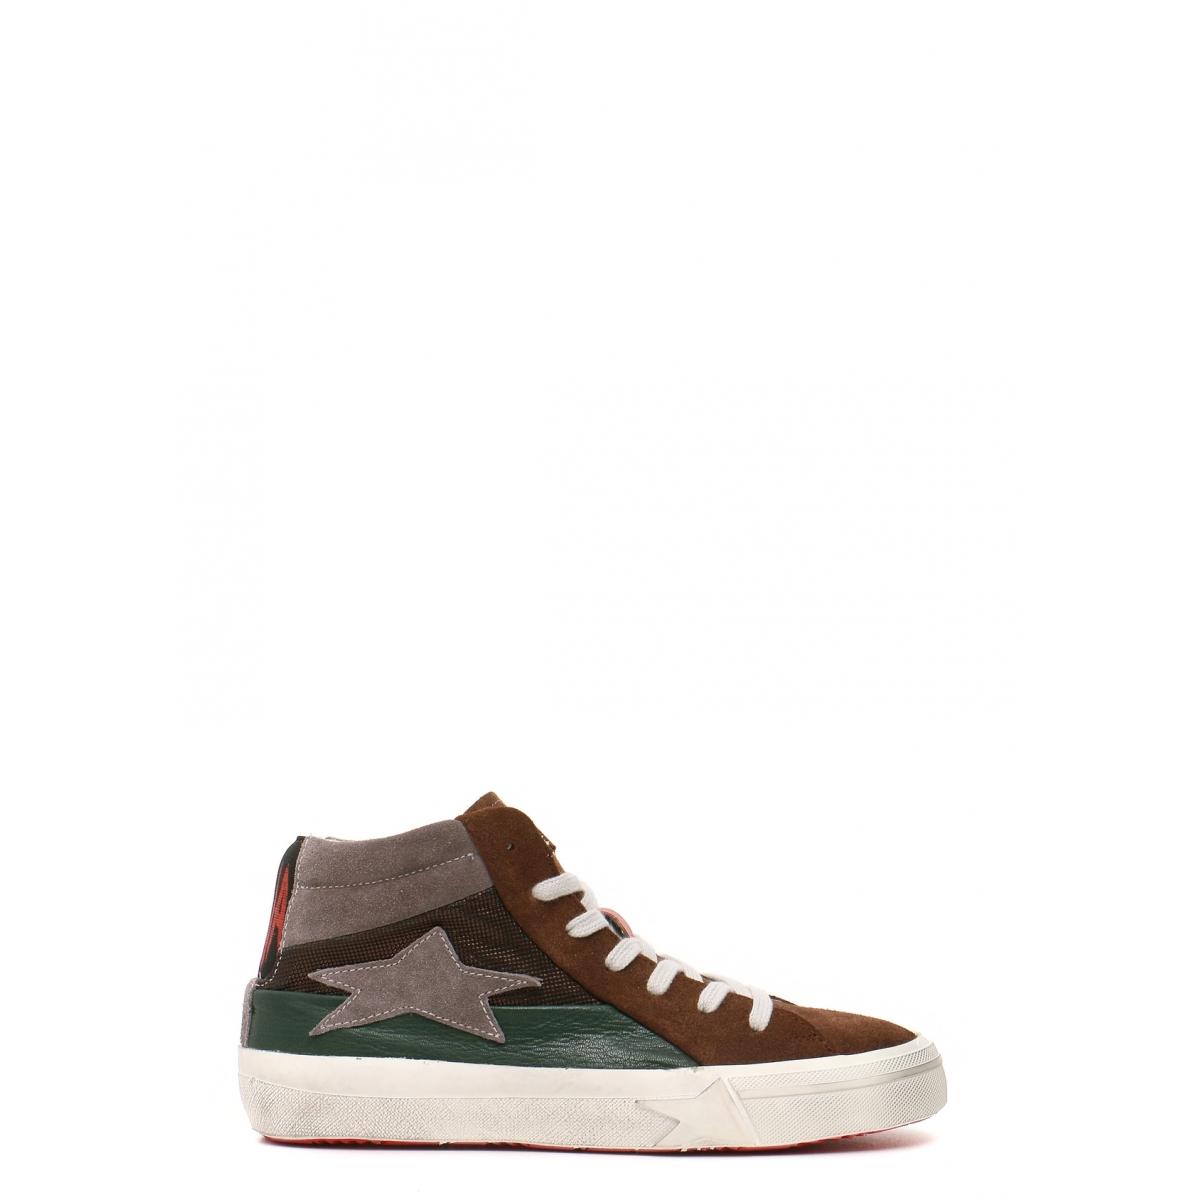 Sneakers alte Ishikawa 22496IT -50%